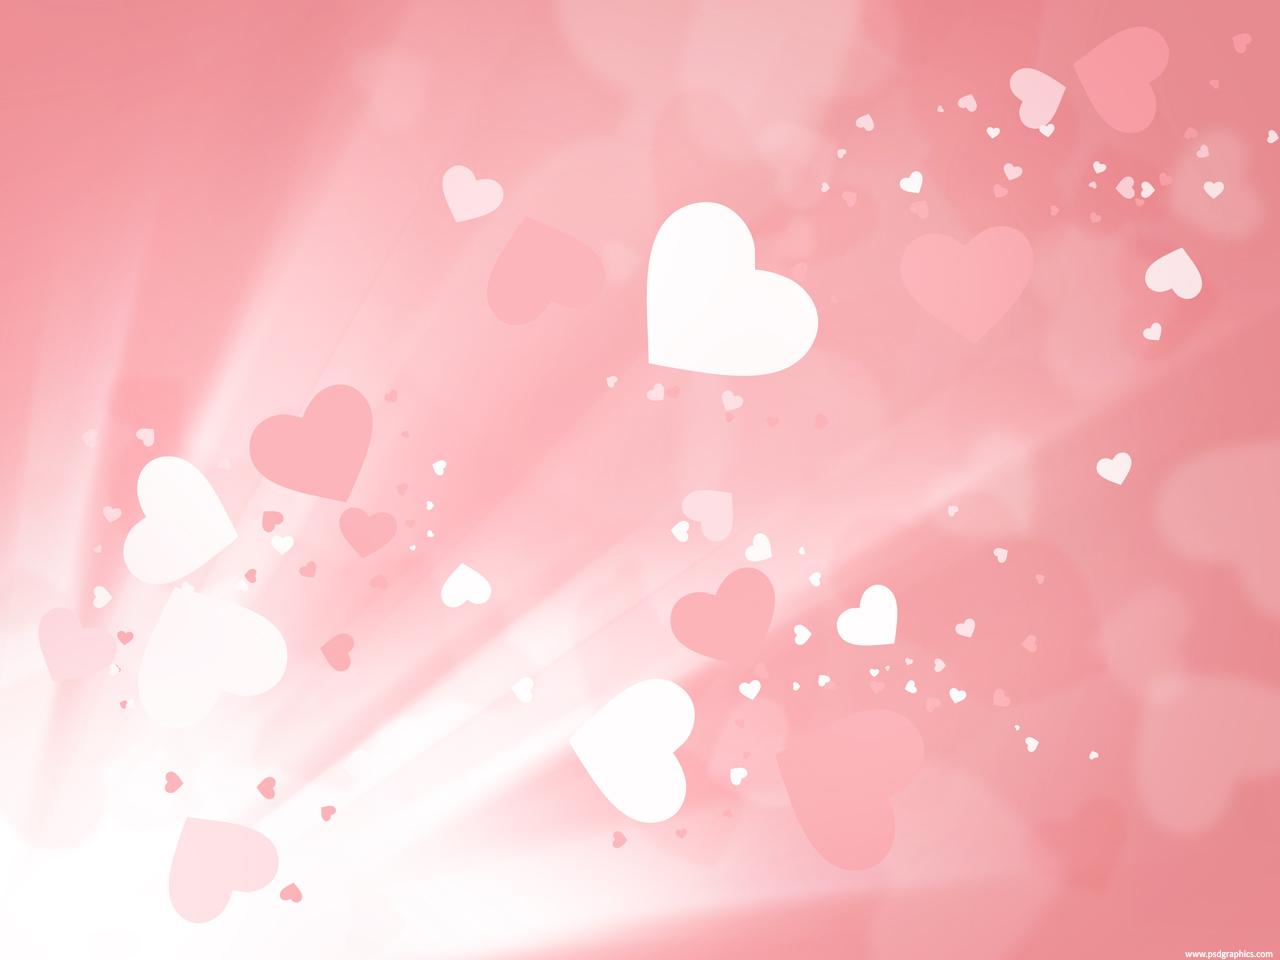 Valentines Day PSDGraphics 1280x960